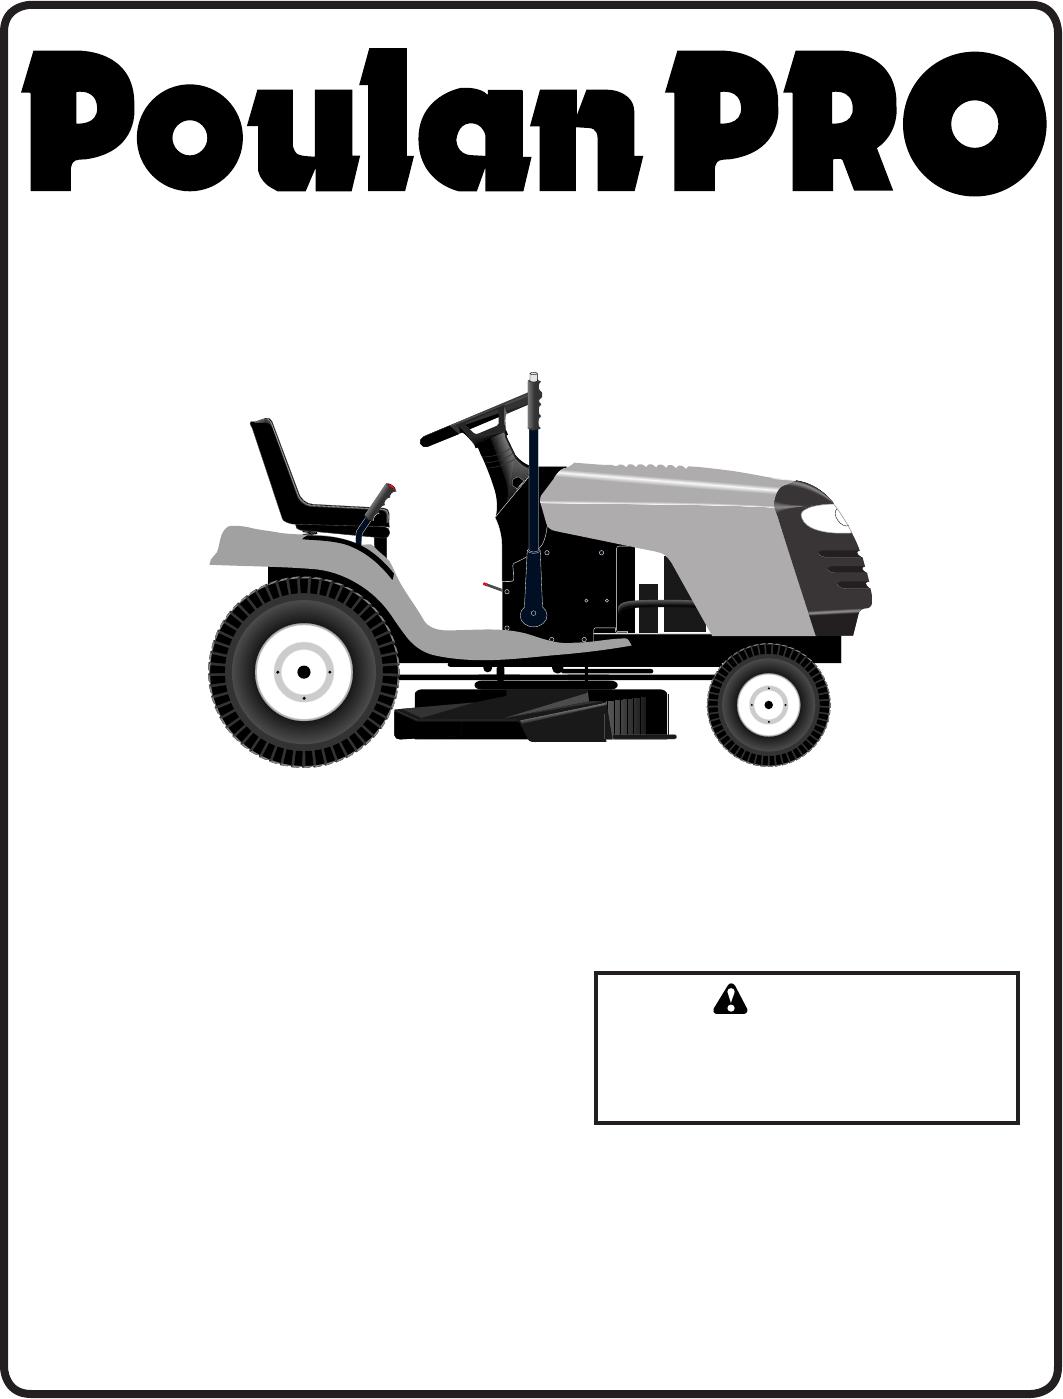 Poulan PB19H42LT Lawn Mower User Manual